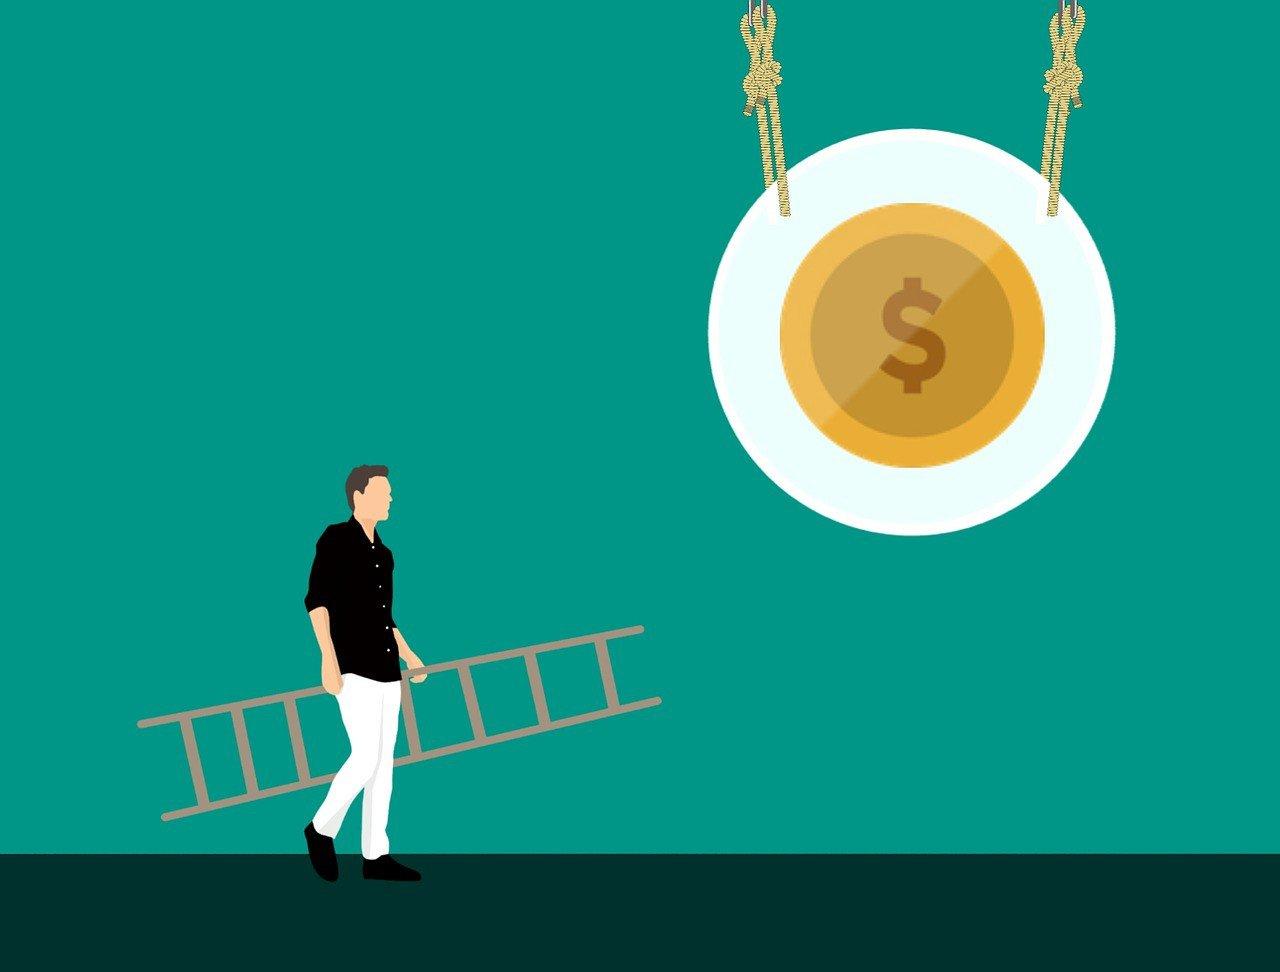 Inflasi Gaya Hidup: Banyak Uang pun Banyak Masalah